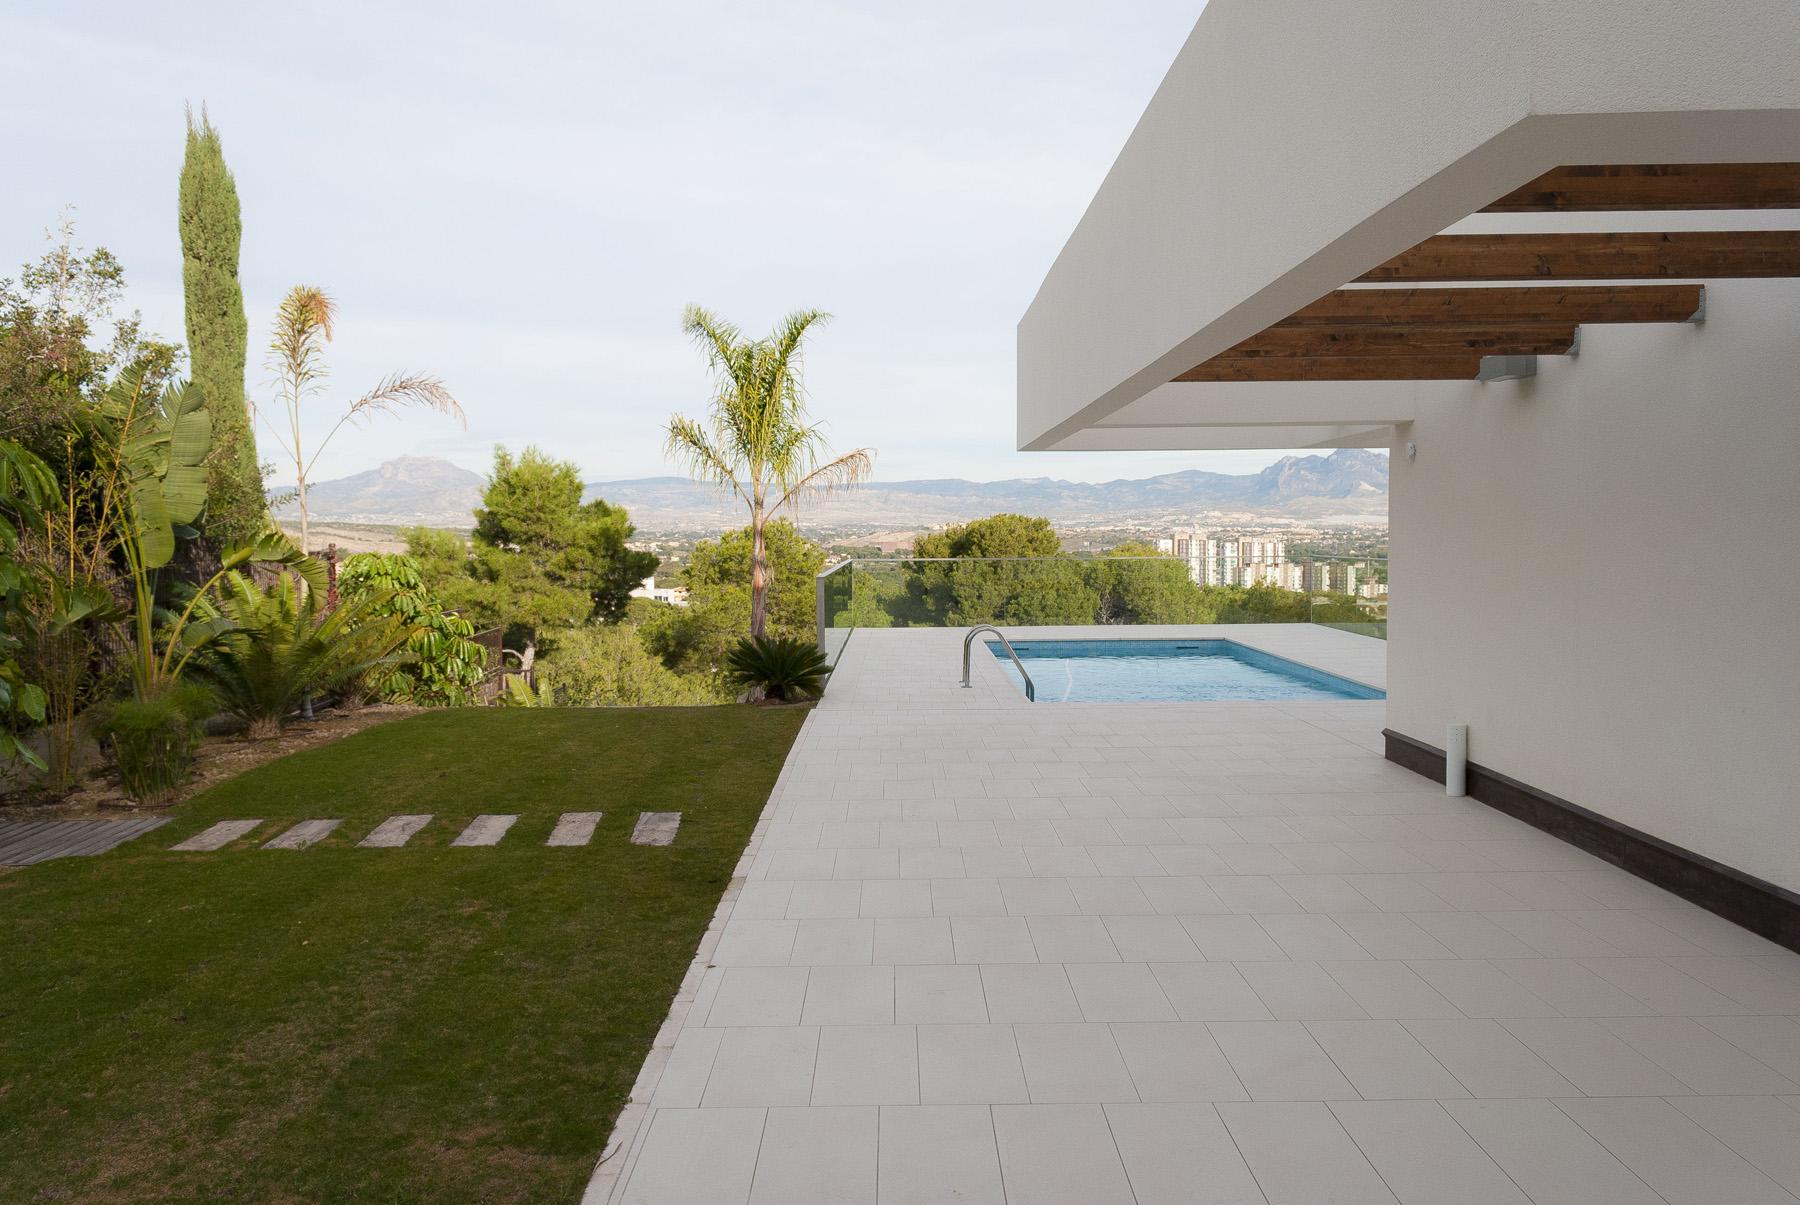 Diseno jardin mediterraneo david jim nez arquitectura y - Diseno jardines madrid ...